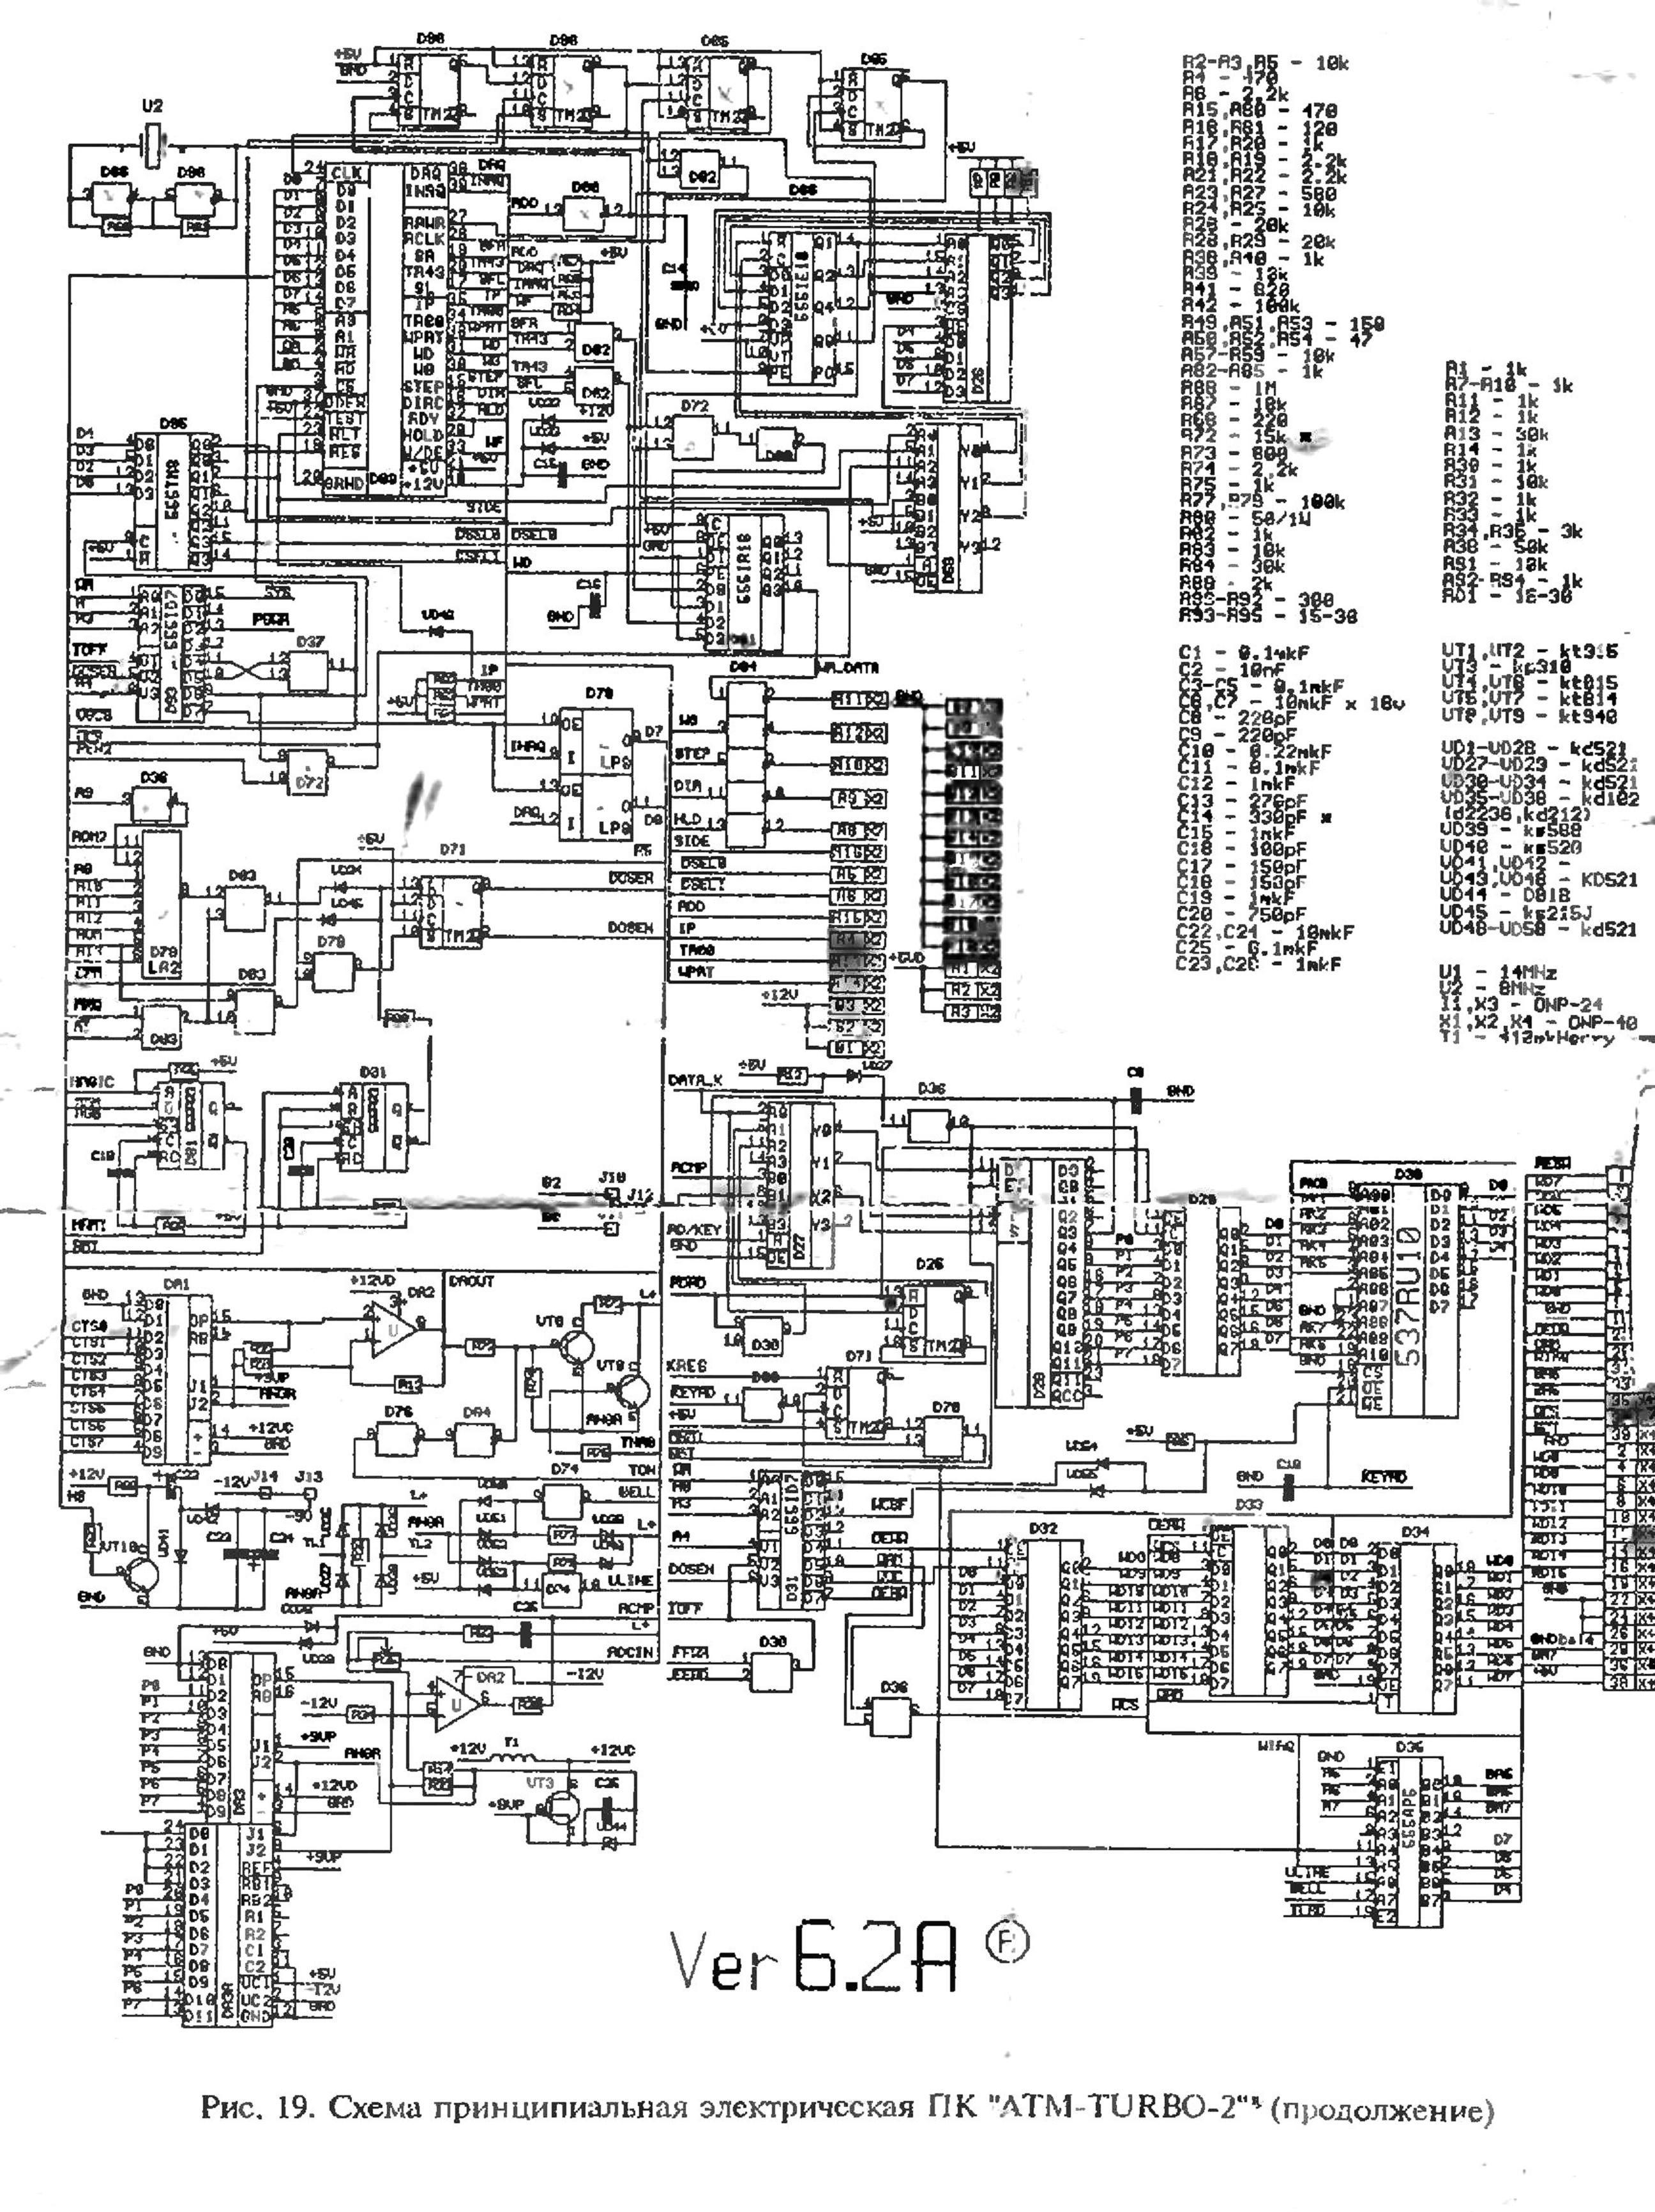 Diagram Of A Turbo Porsche 944 Engine Oil Flow Transaxles Atm Best Context Example Newest Fluid Mechanics